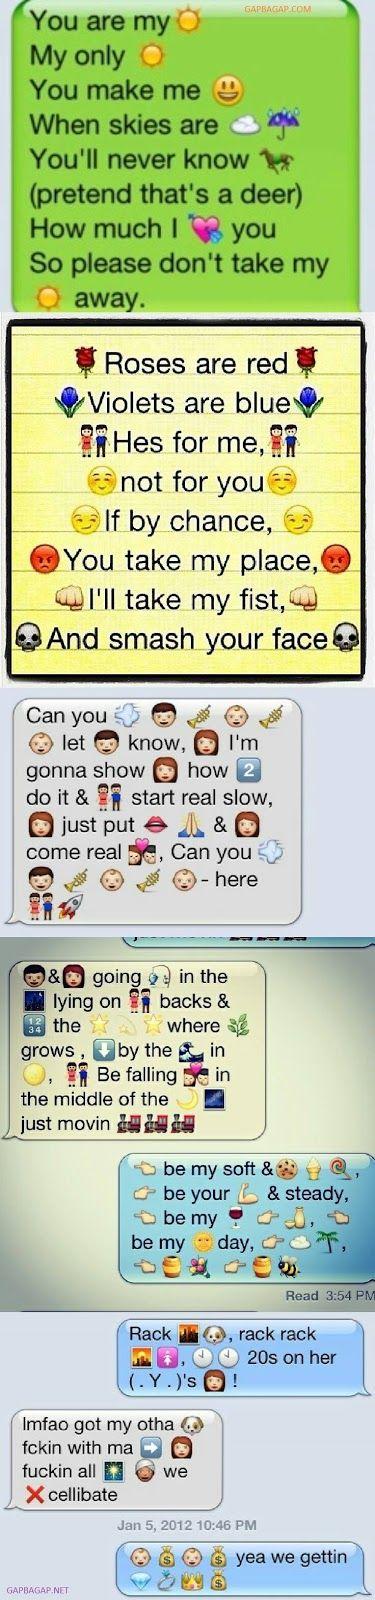 Top 10 Hilarious Emoji Conversations